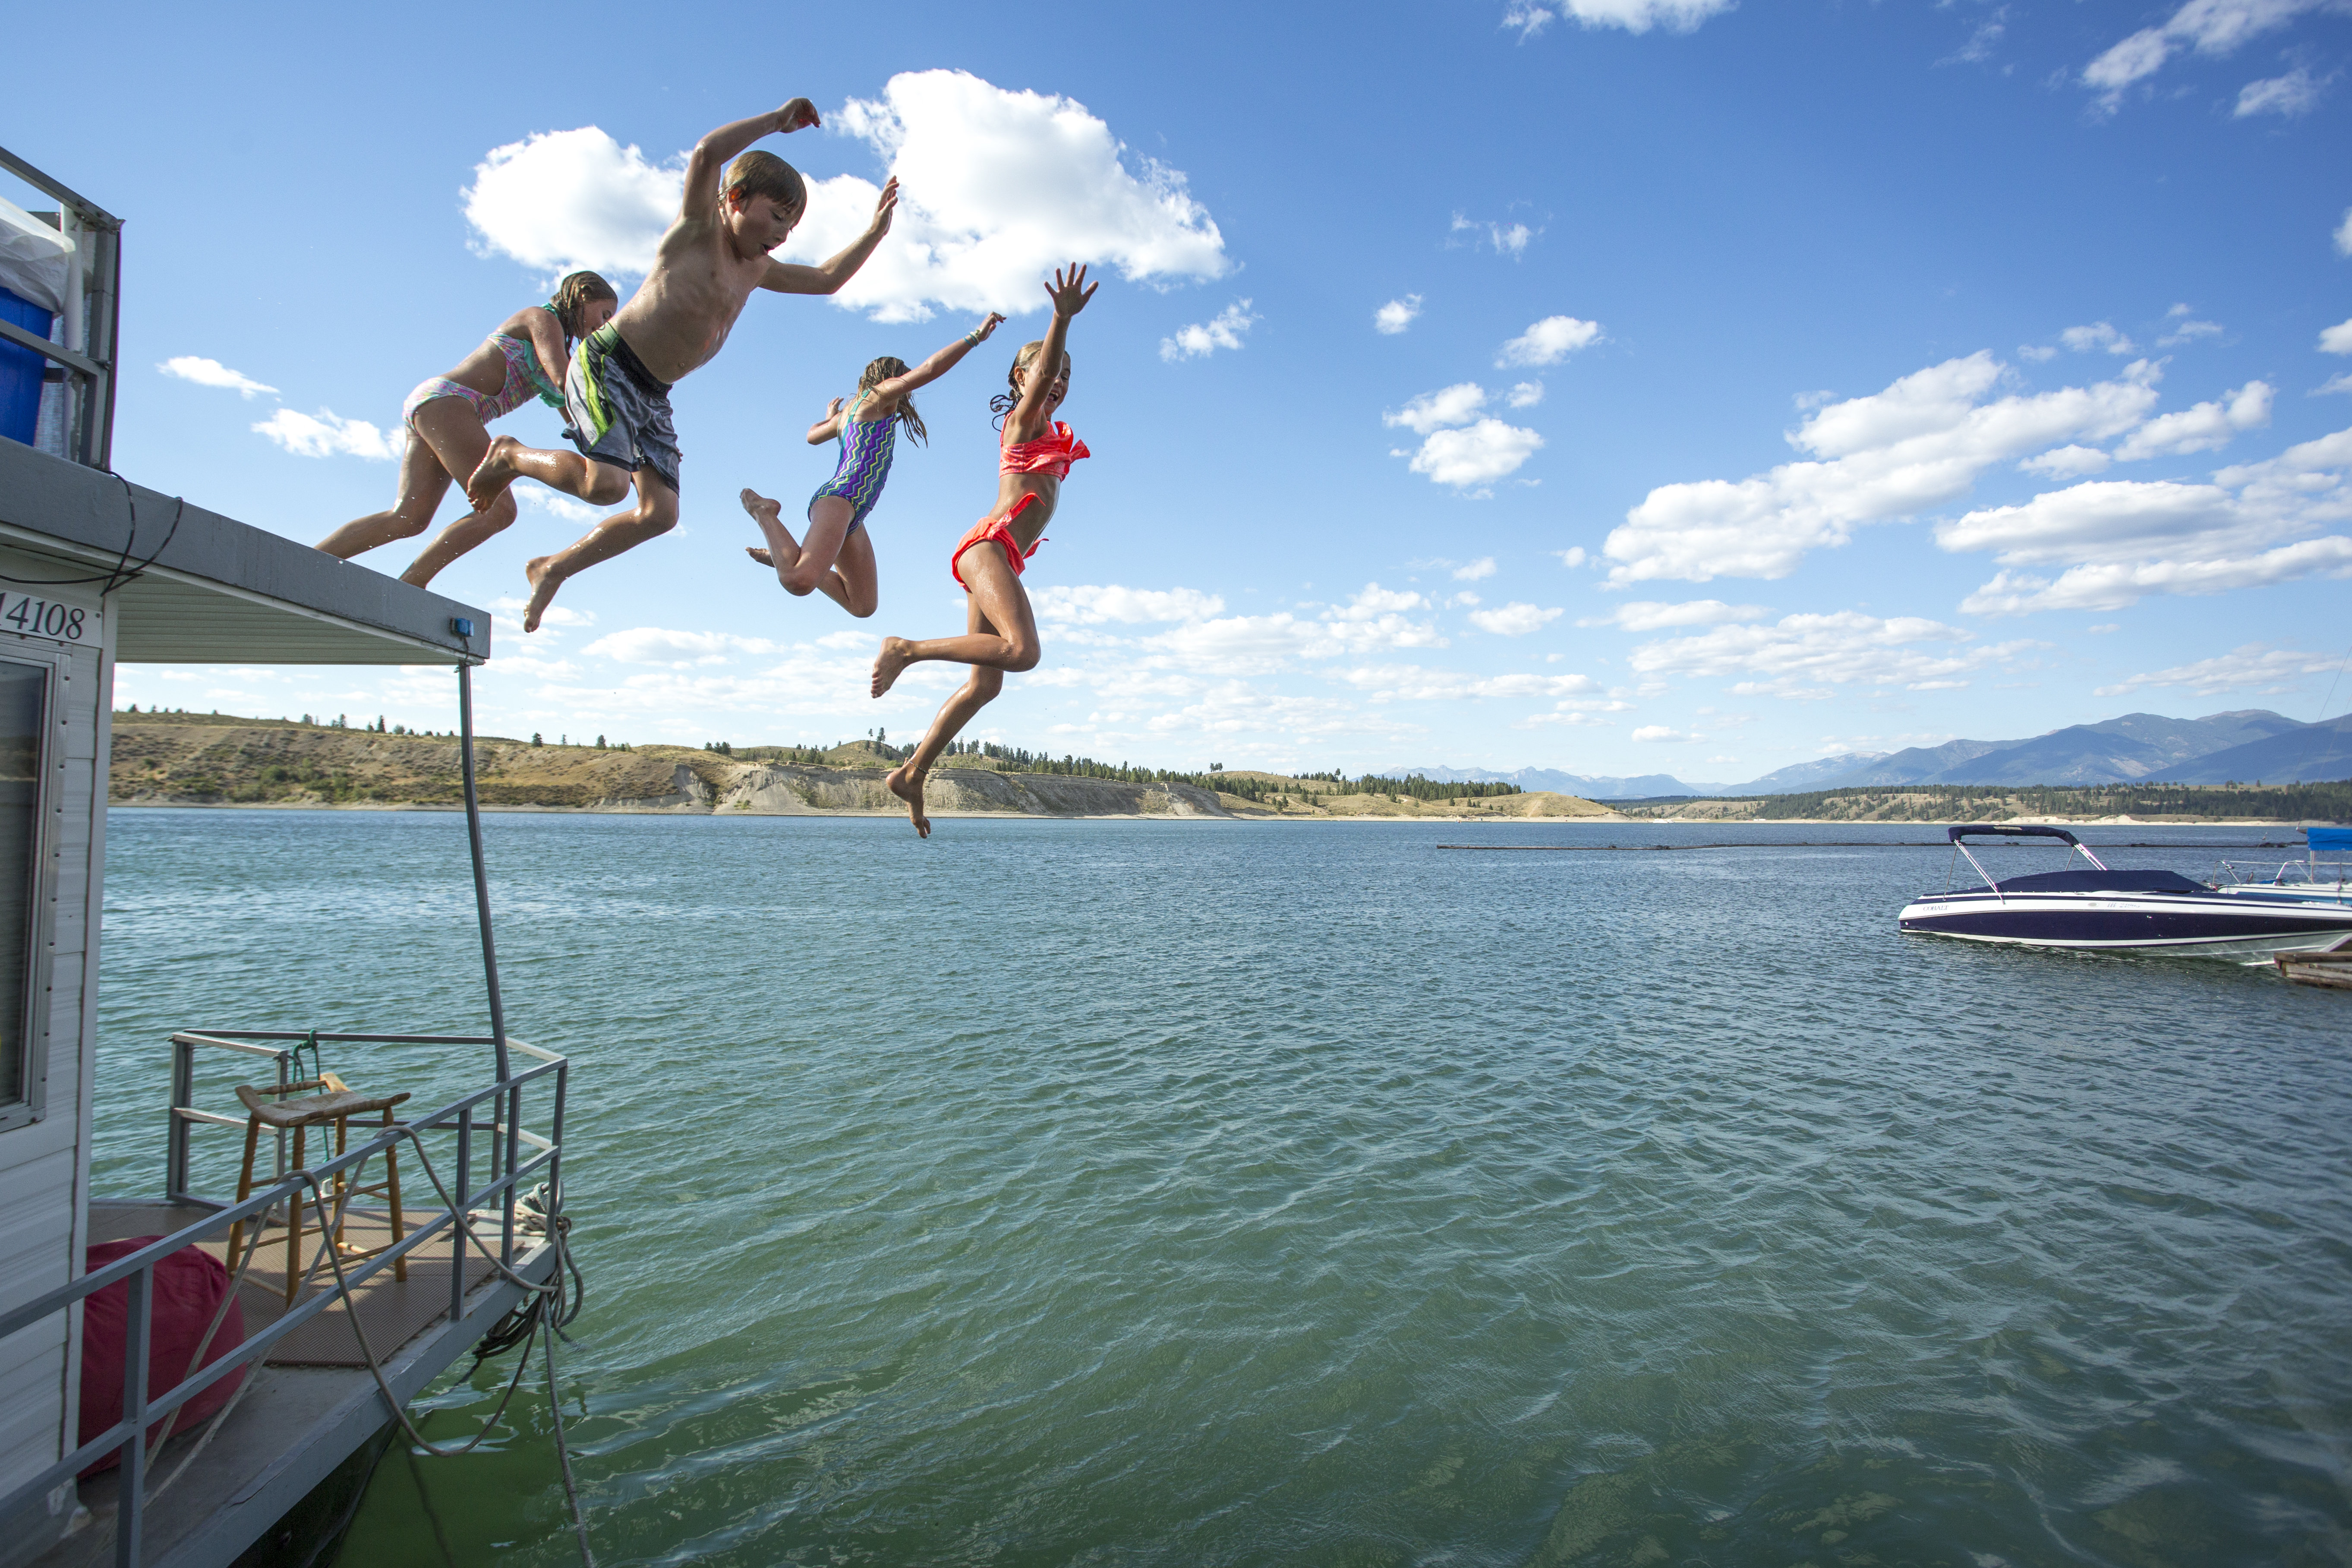 MK_Kids jumping off boat-13.jpg